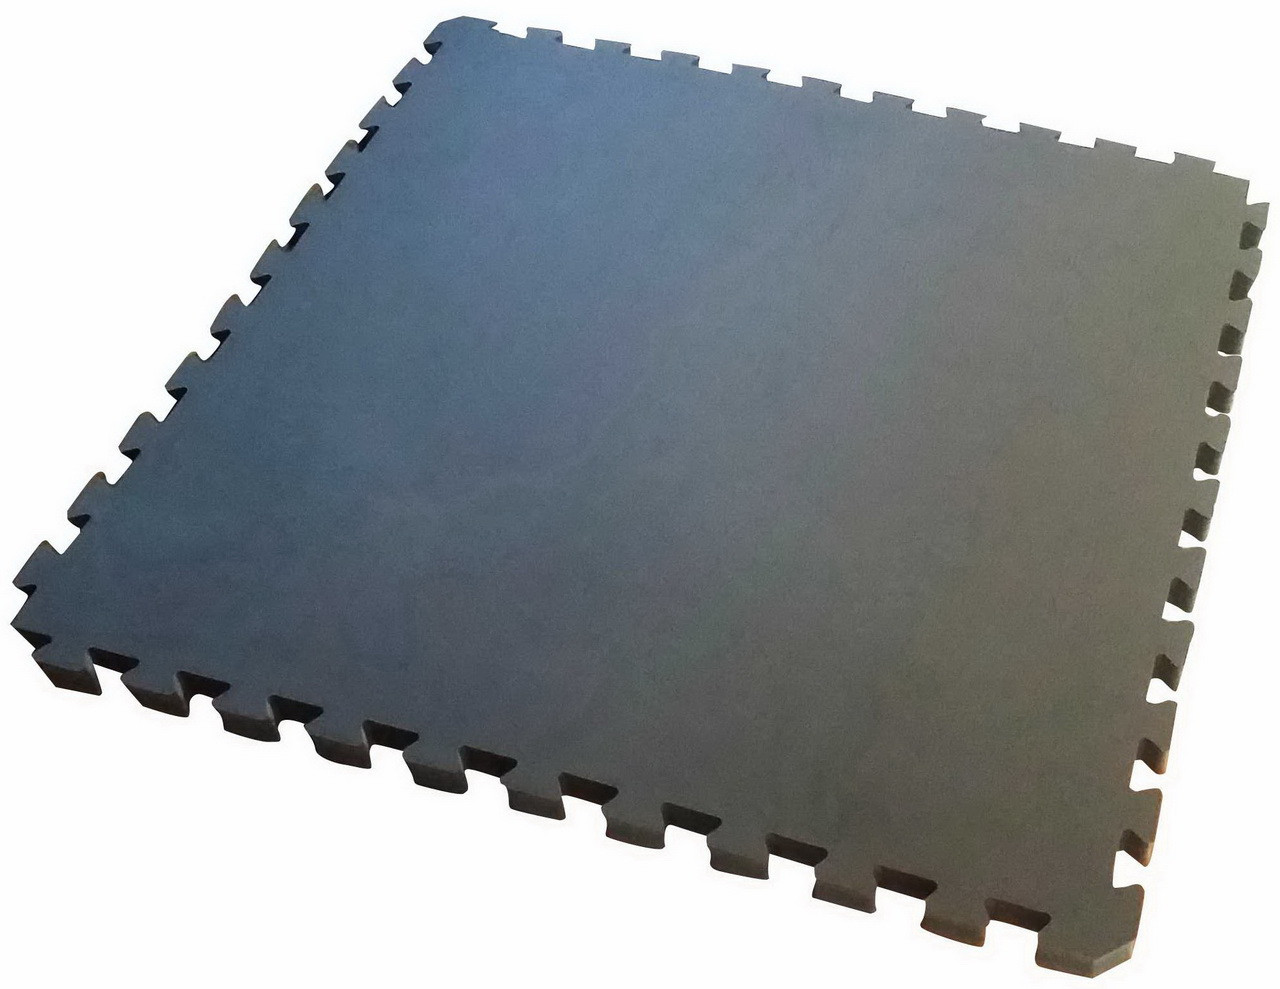 Мат татами «IZOLON BASE» ласточкин хвост 40 мм (Серый)